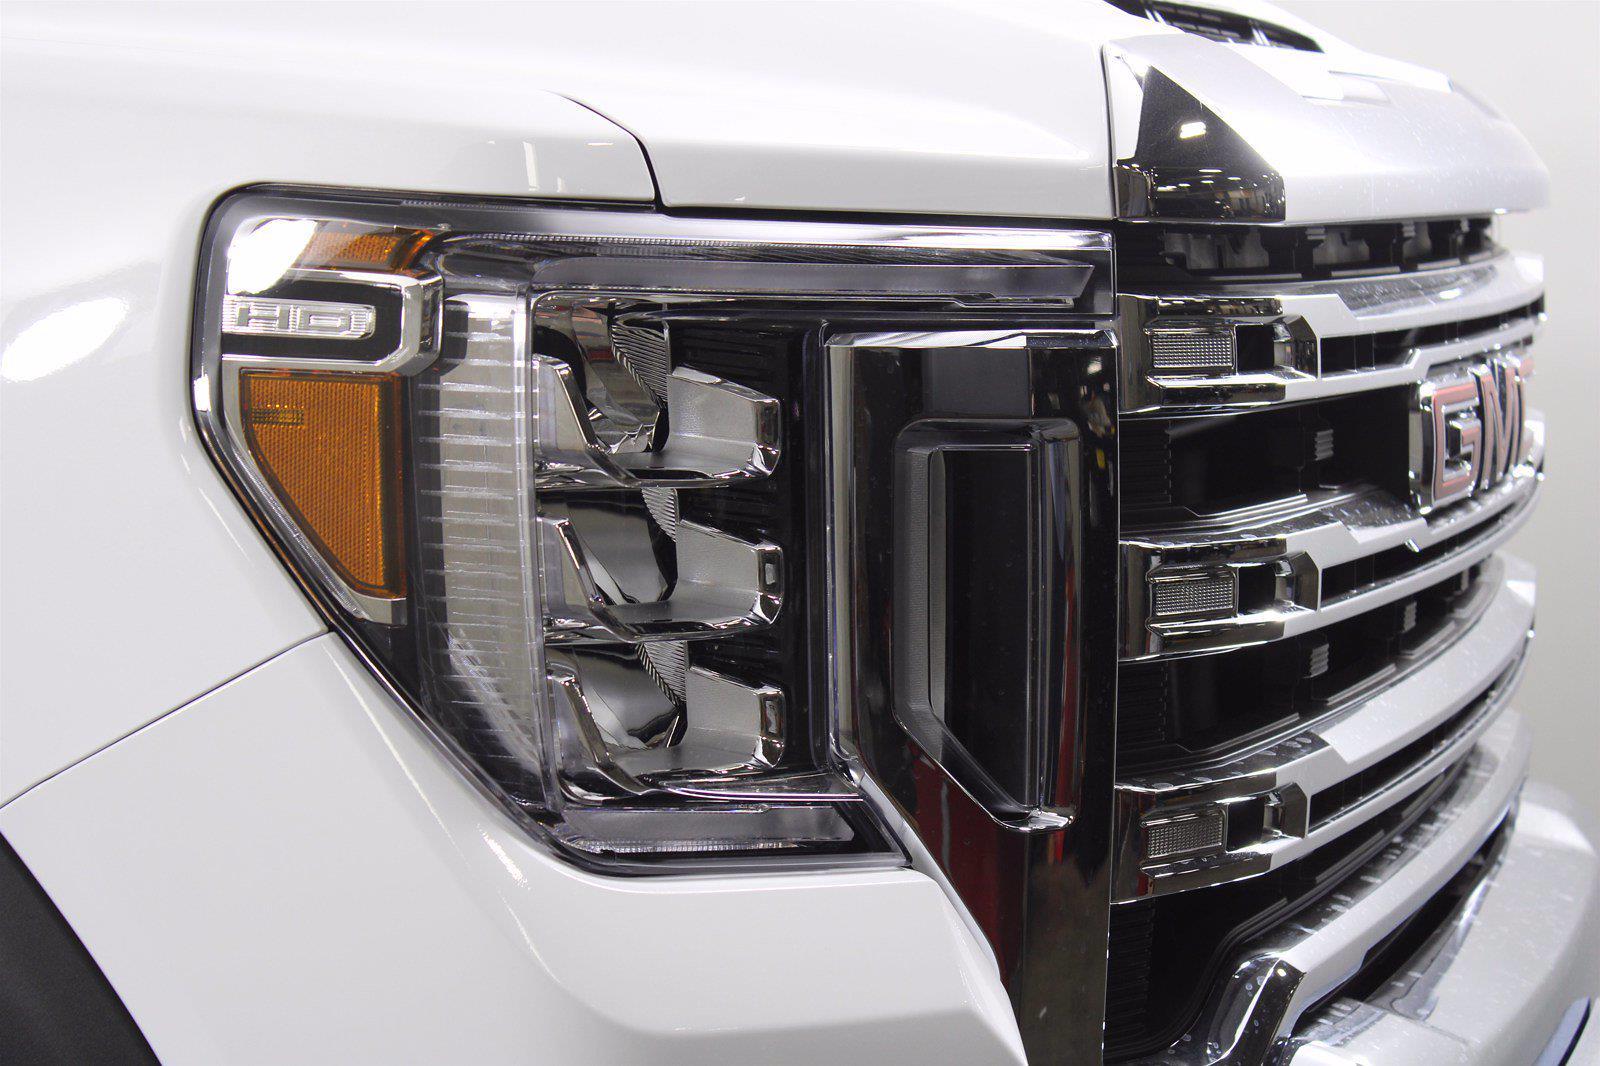 2022 Sierra 2500 Regular Cab 4x4,  Pickup #D420023 - photo 5